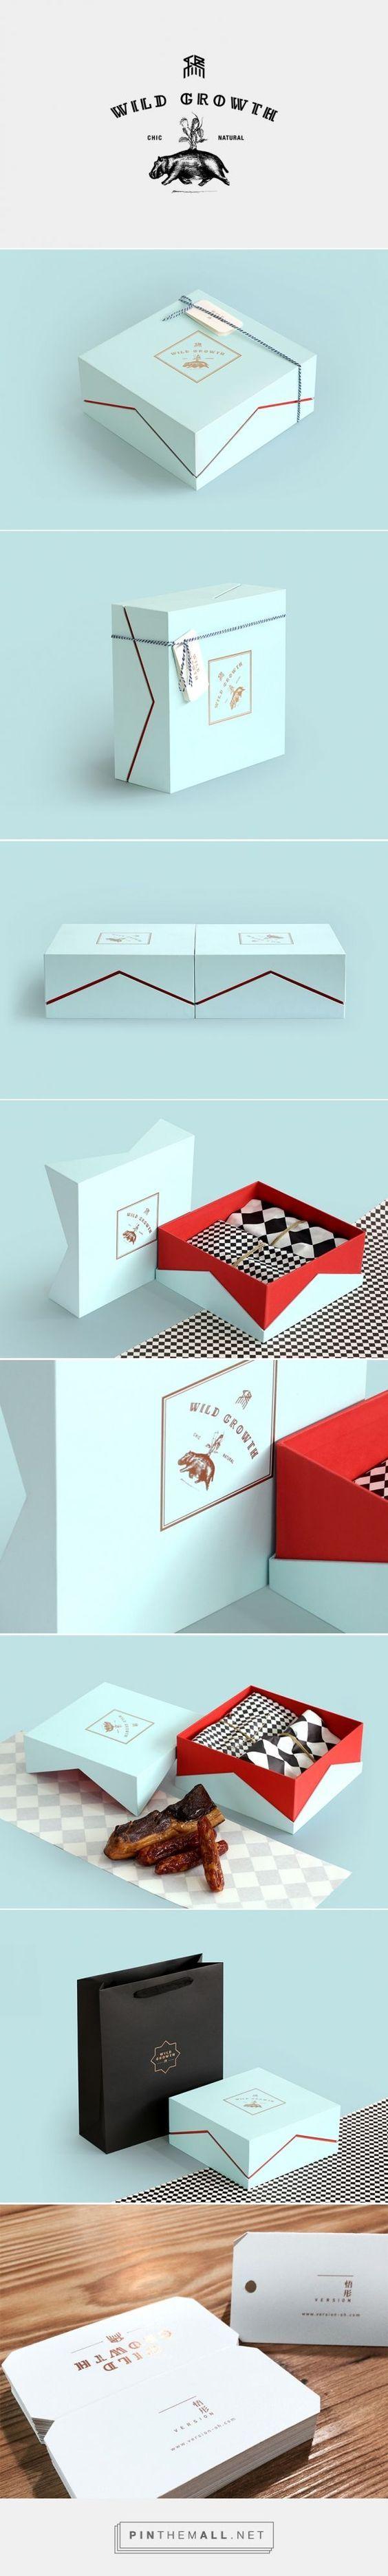 Wild Growth Packaging  | Fivestar Branding – Design and Branding Agency & Inspiration Gallery